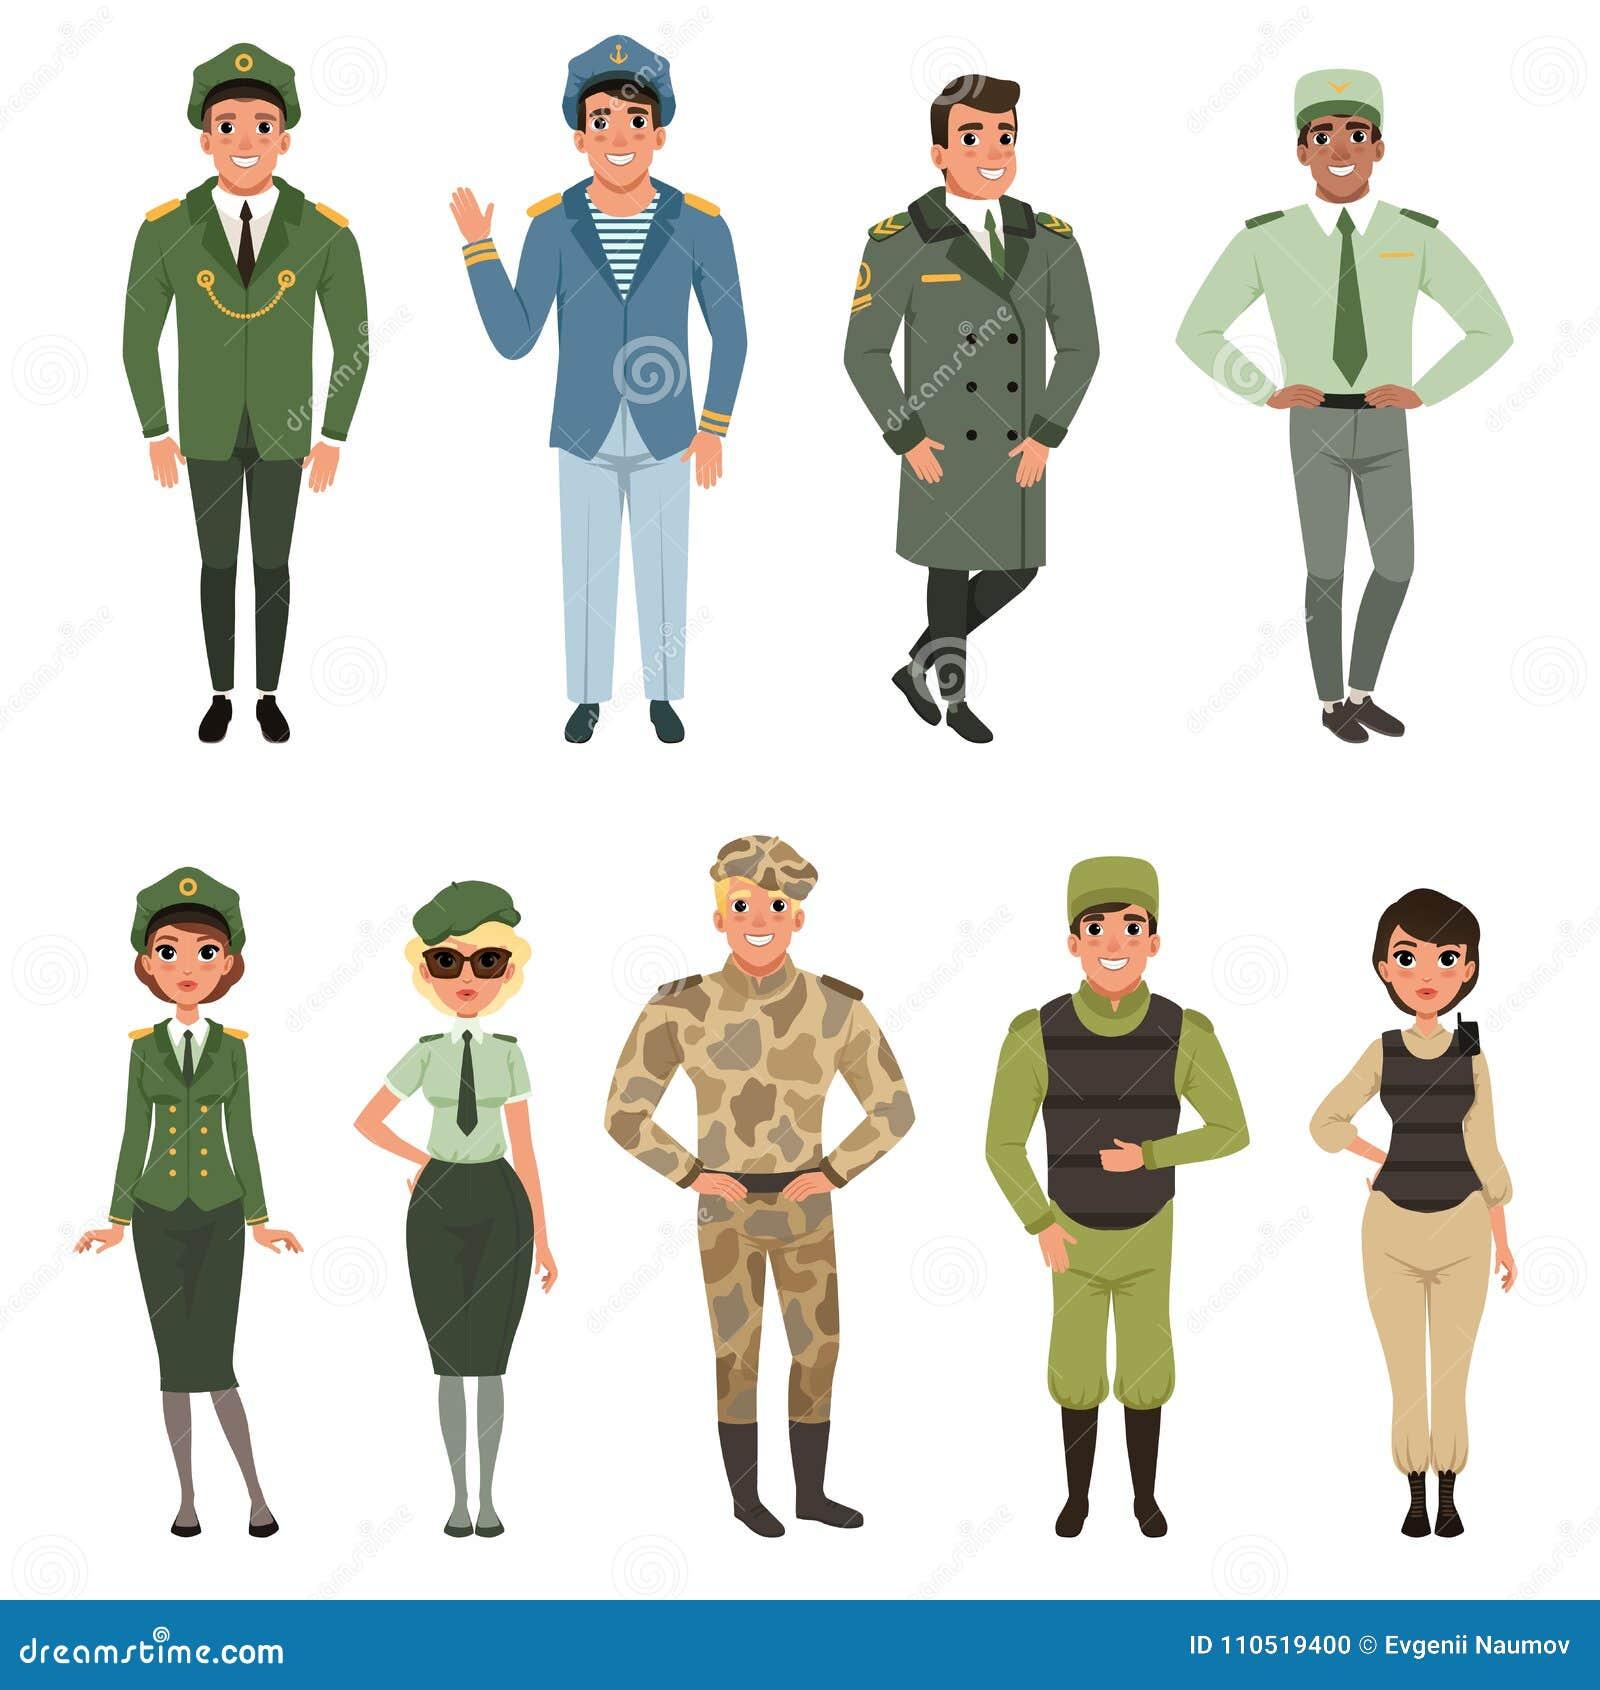 bb3ad39bba0 Στρατιωτικές στολές καθορισμένες, στρατιωτικός ανώτερος υπάλληλος ...